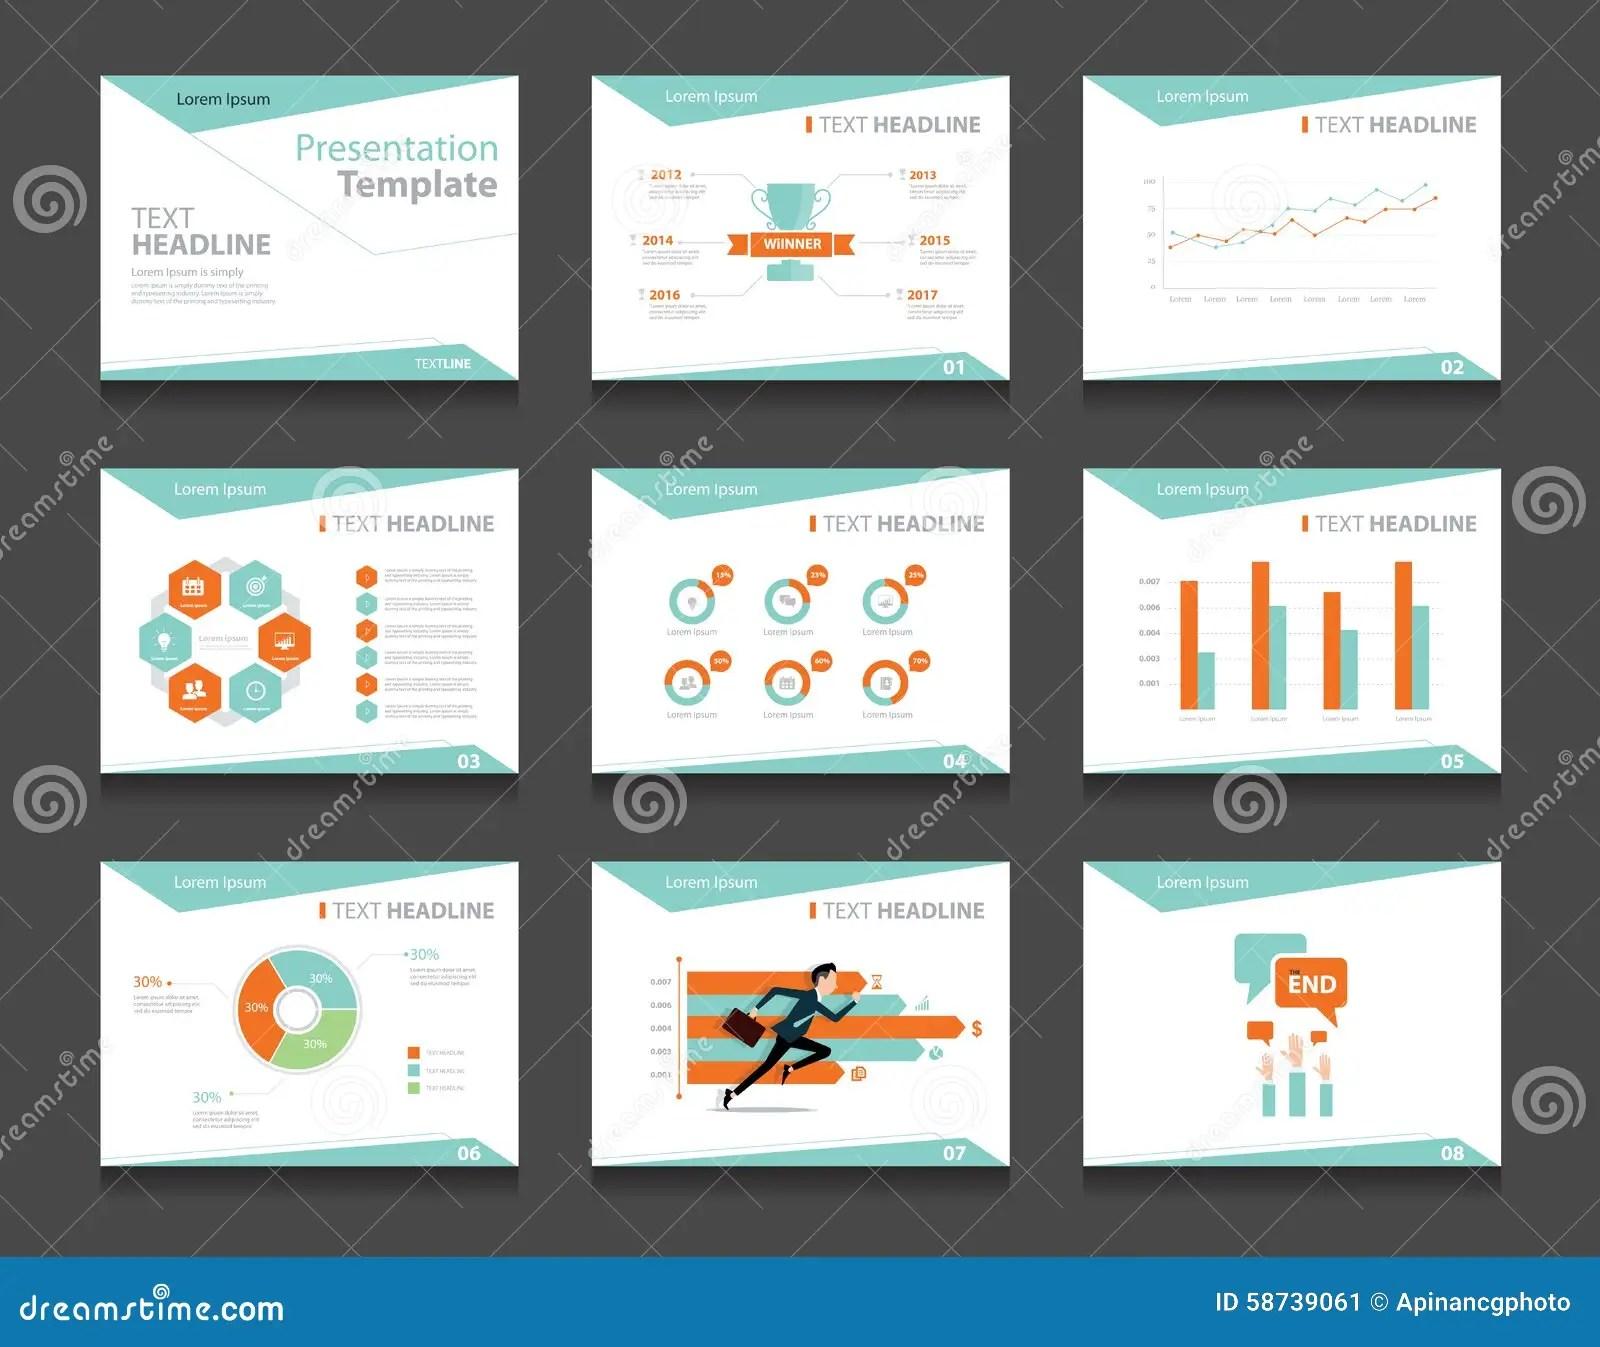 Company Profile Ppt Editable Powerpoint Presentation Business Powerpoint Presentation Durdgereport632webfc2